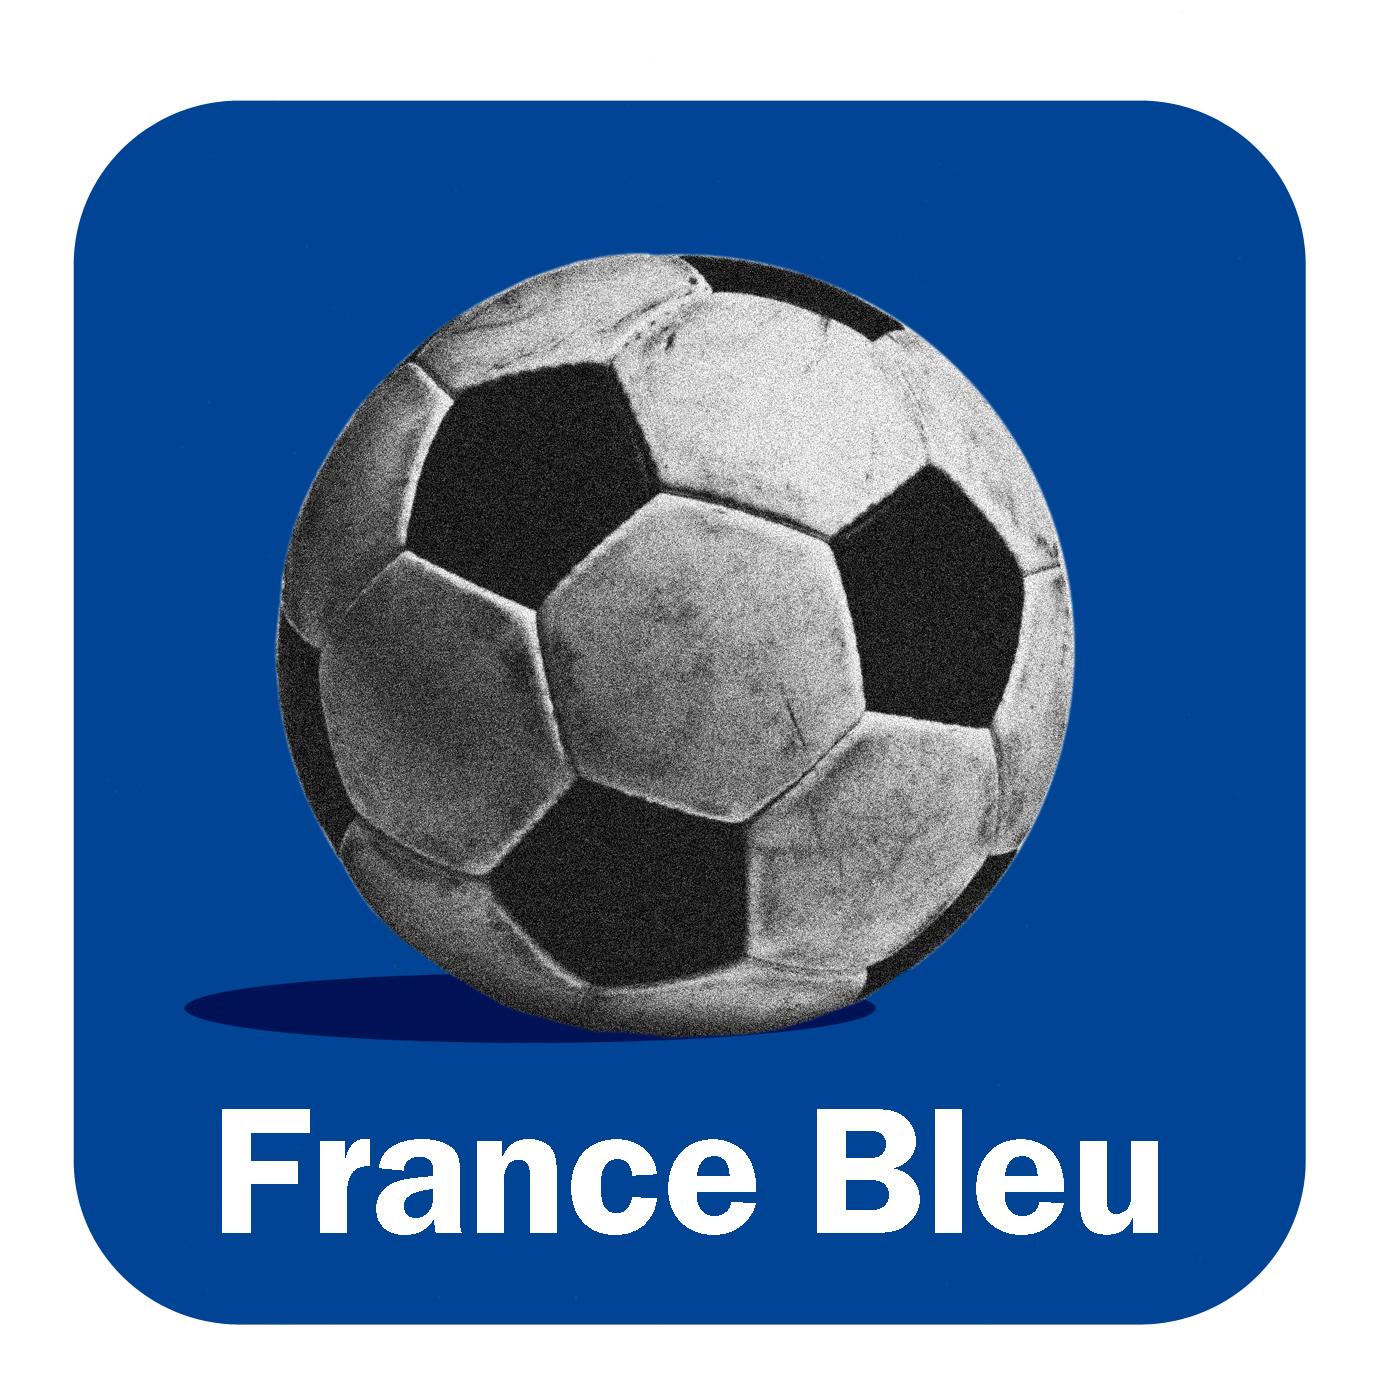 100% Aiglons France Bleu Azur